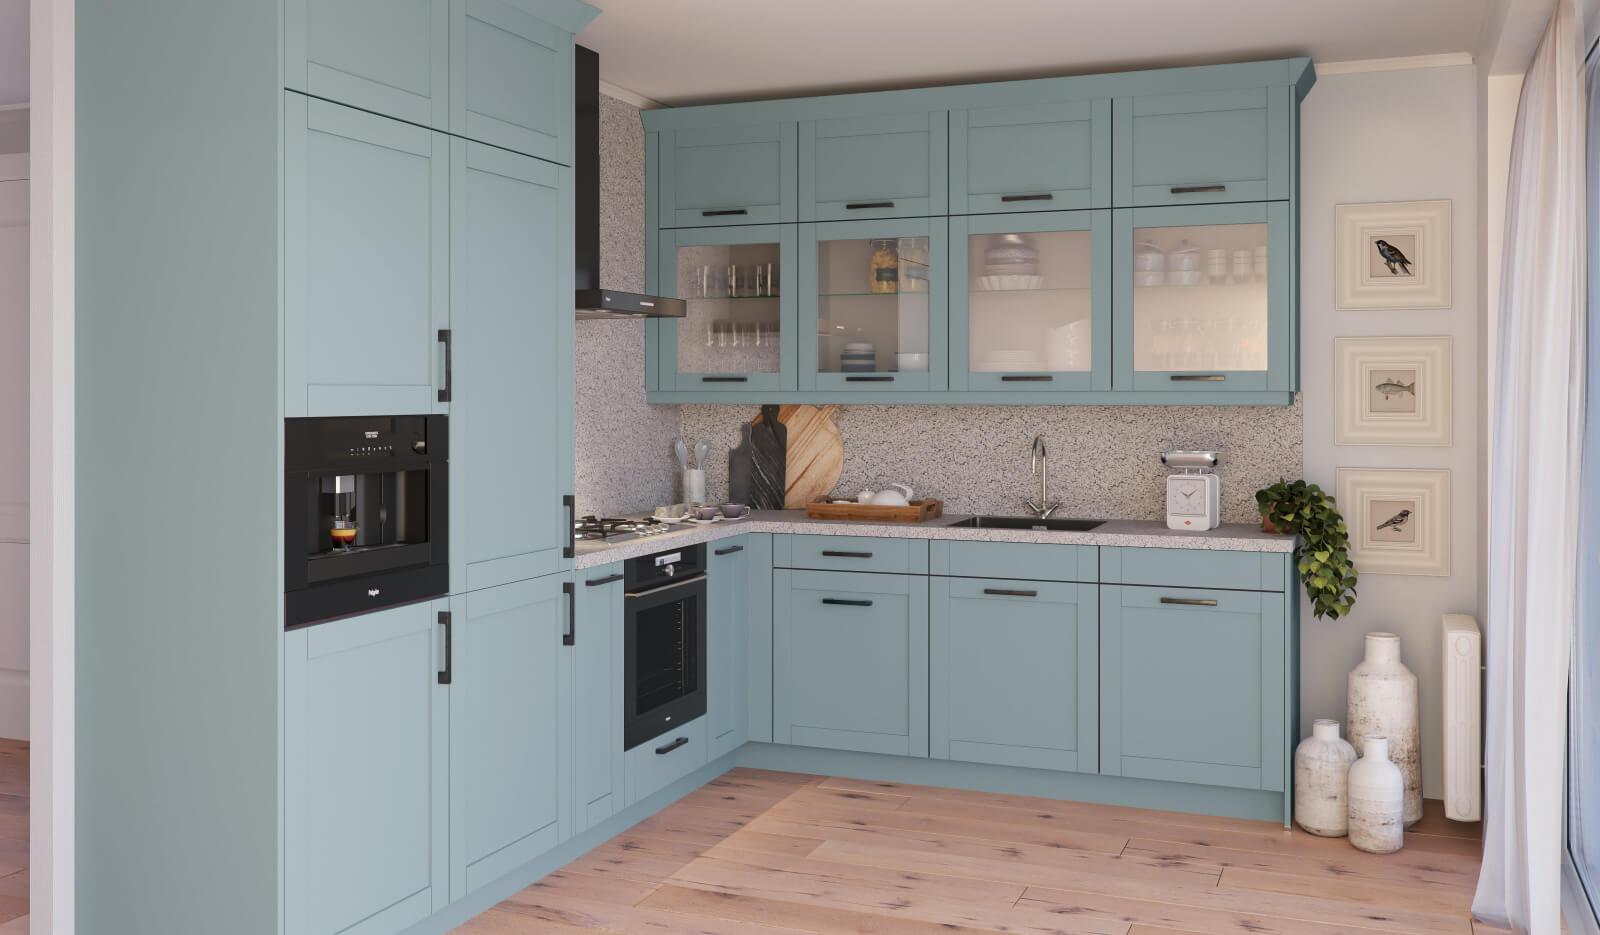 Keuken Romantiek NCS hemelsblauw - hoekkeuken